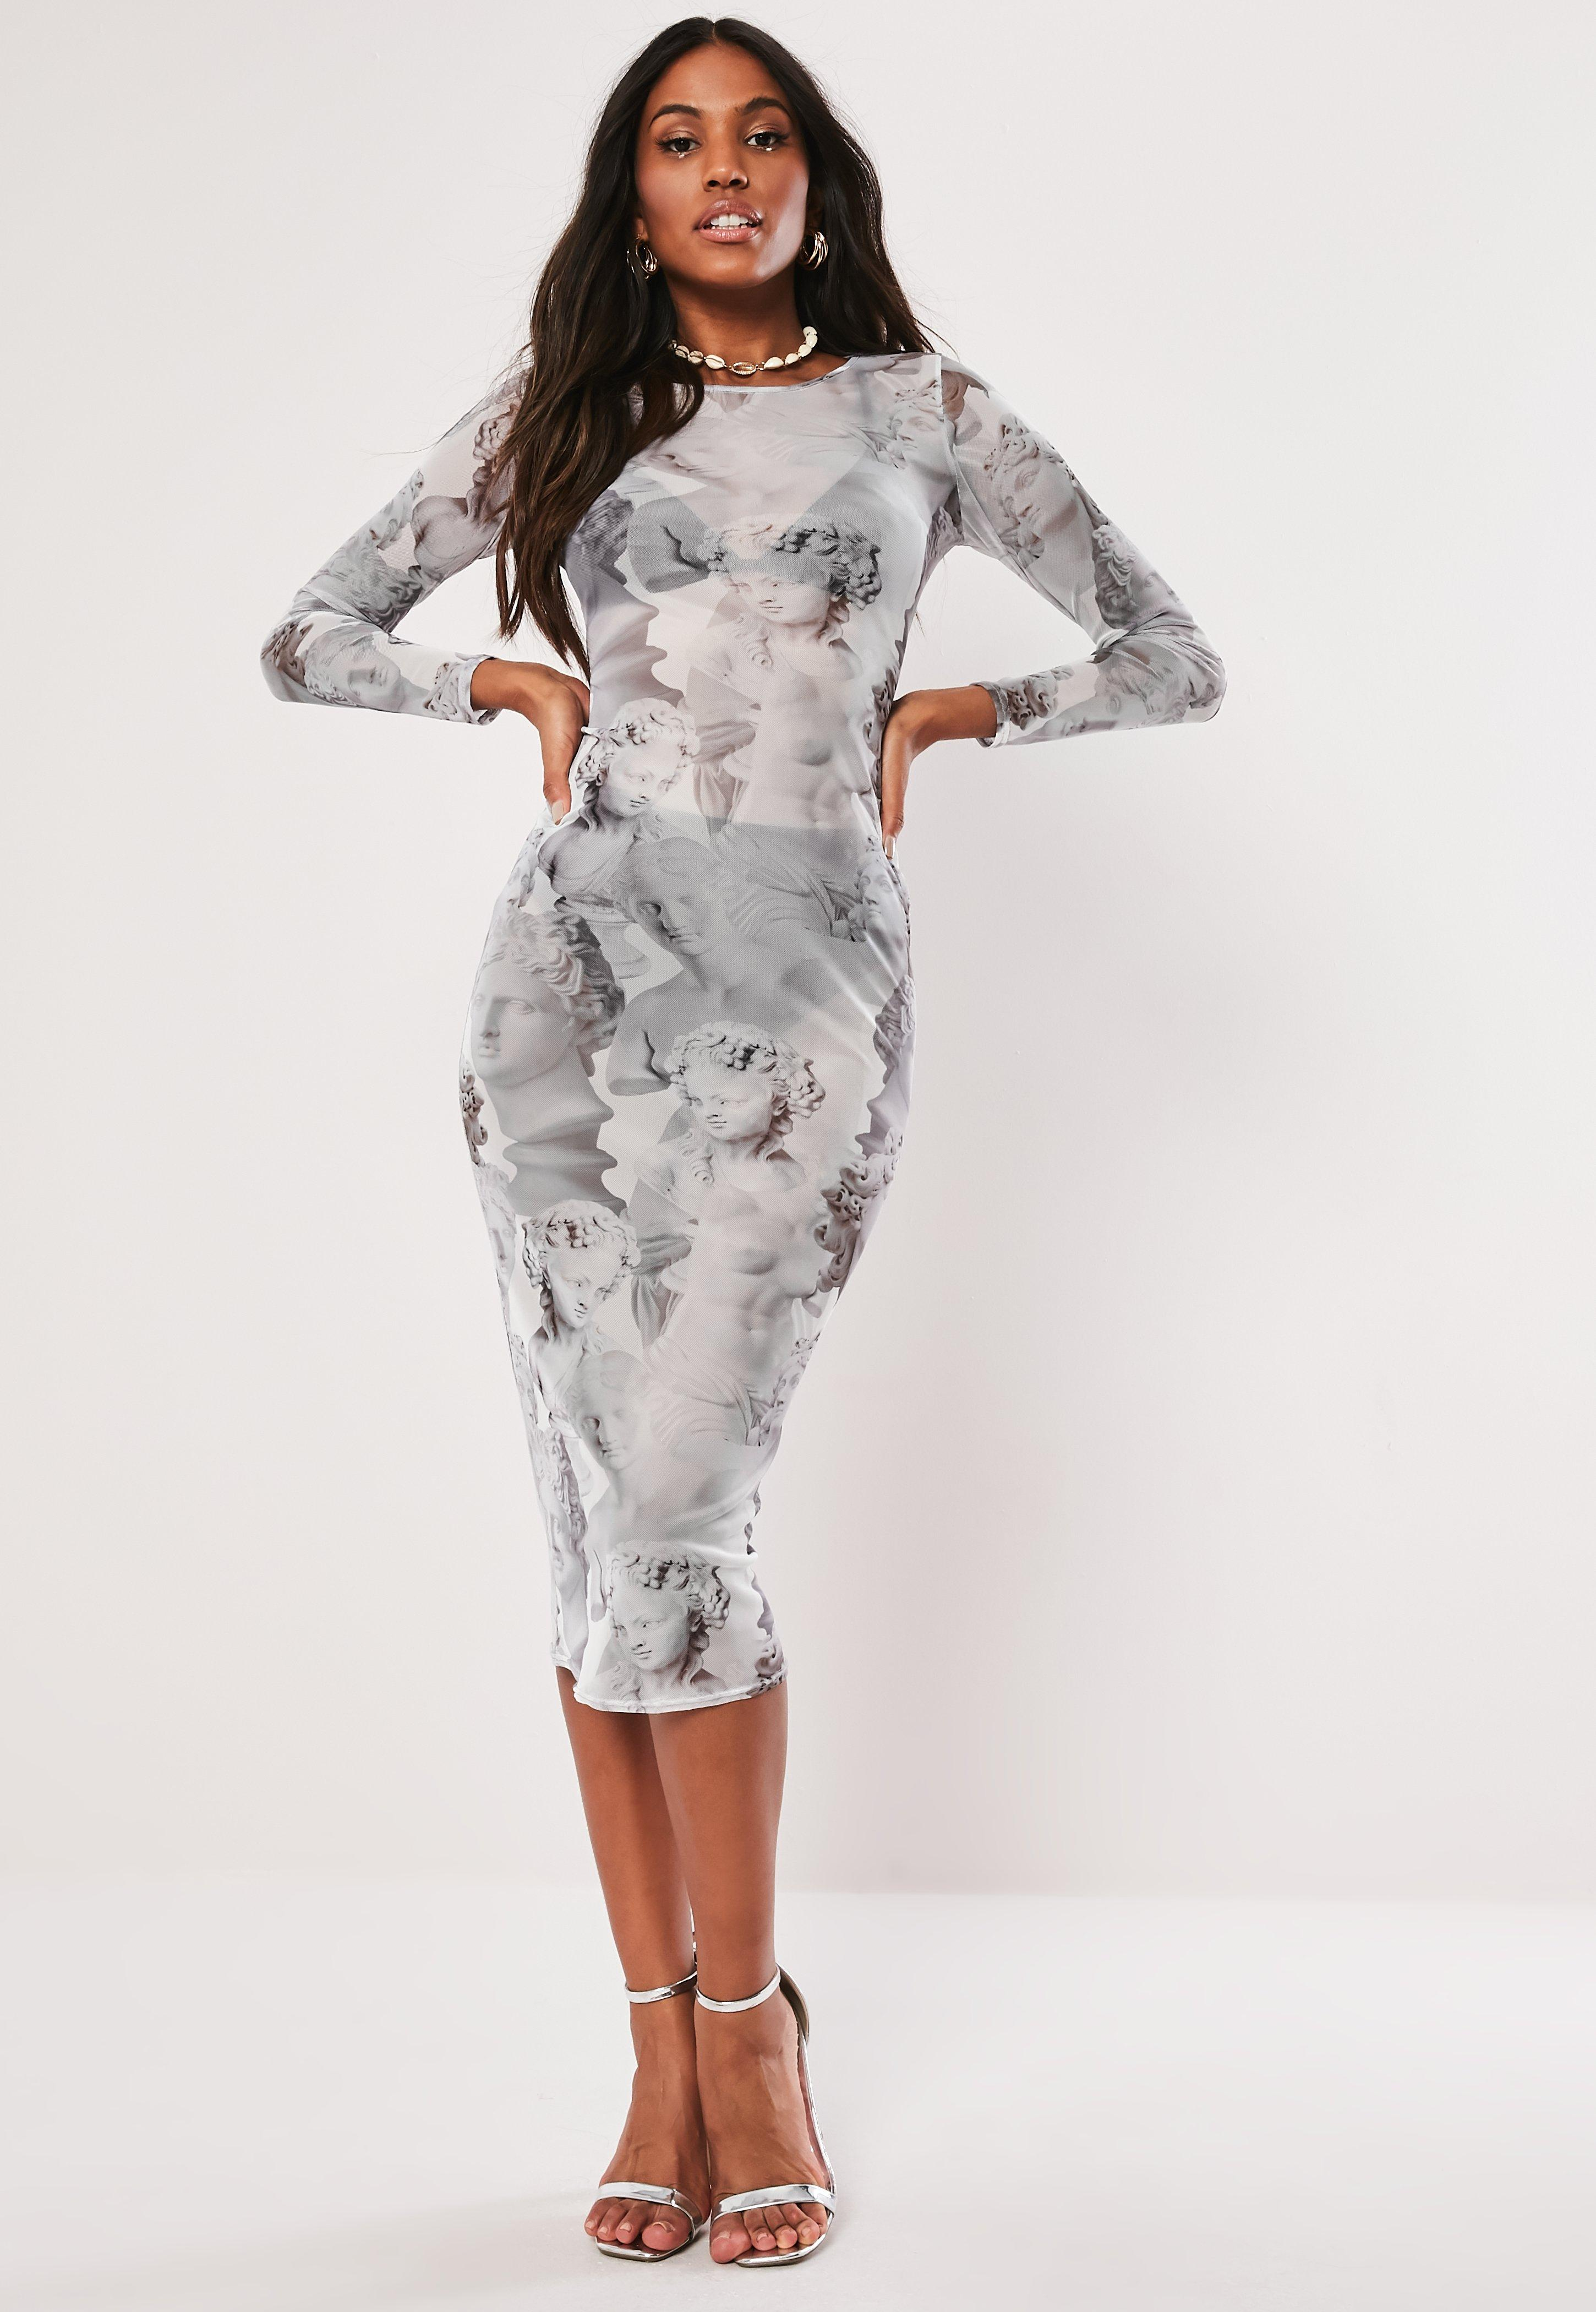 a90cc8f716 Mesh Dresses